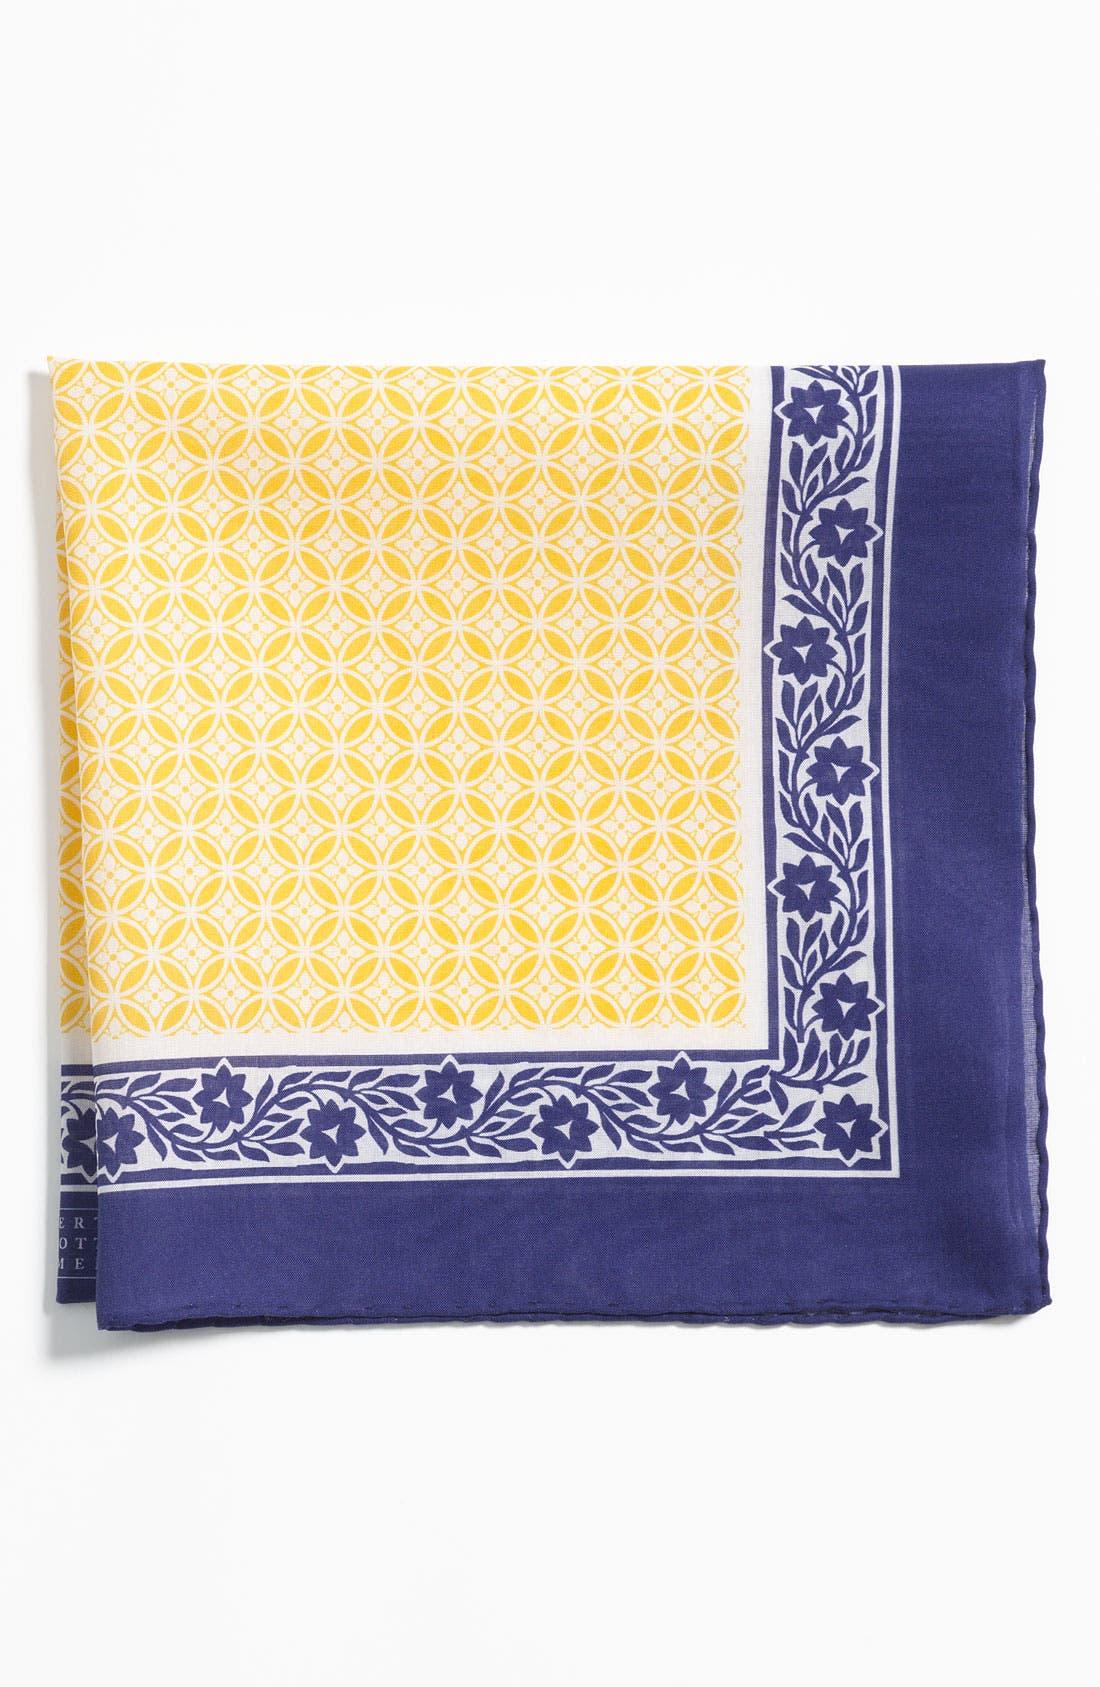 Alternate Image 1 Selected - Robert Talbott Cotton Pocket Square